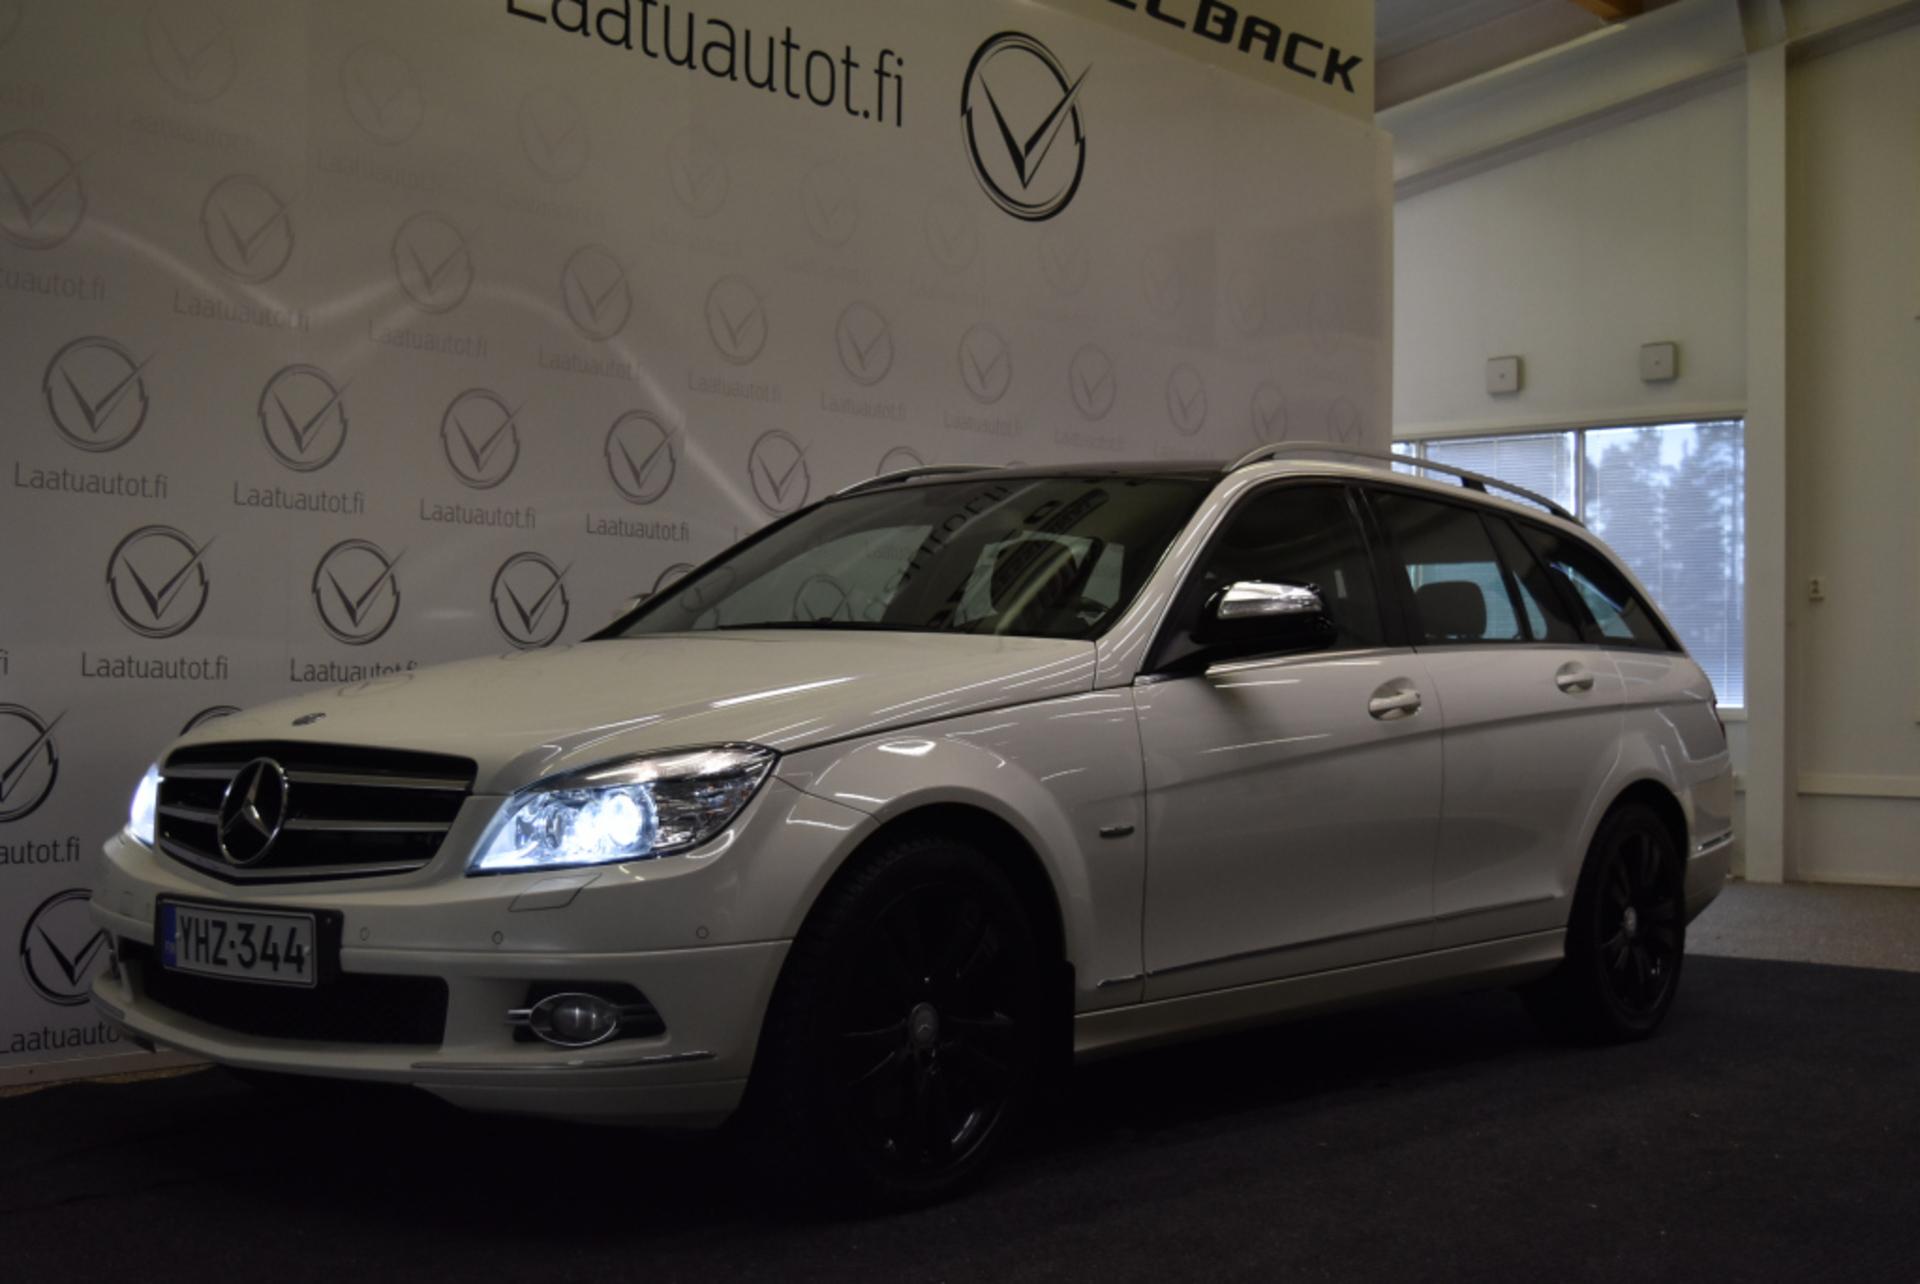 MERCEDES-BENZ C 320 CDI T 4Matic A Avantgarde - Hieno Suomi-auto nahkasisustalla,  Juuri kats! Korko 1, 99%! Käsiraha alkaen 0e!